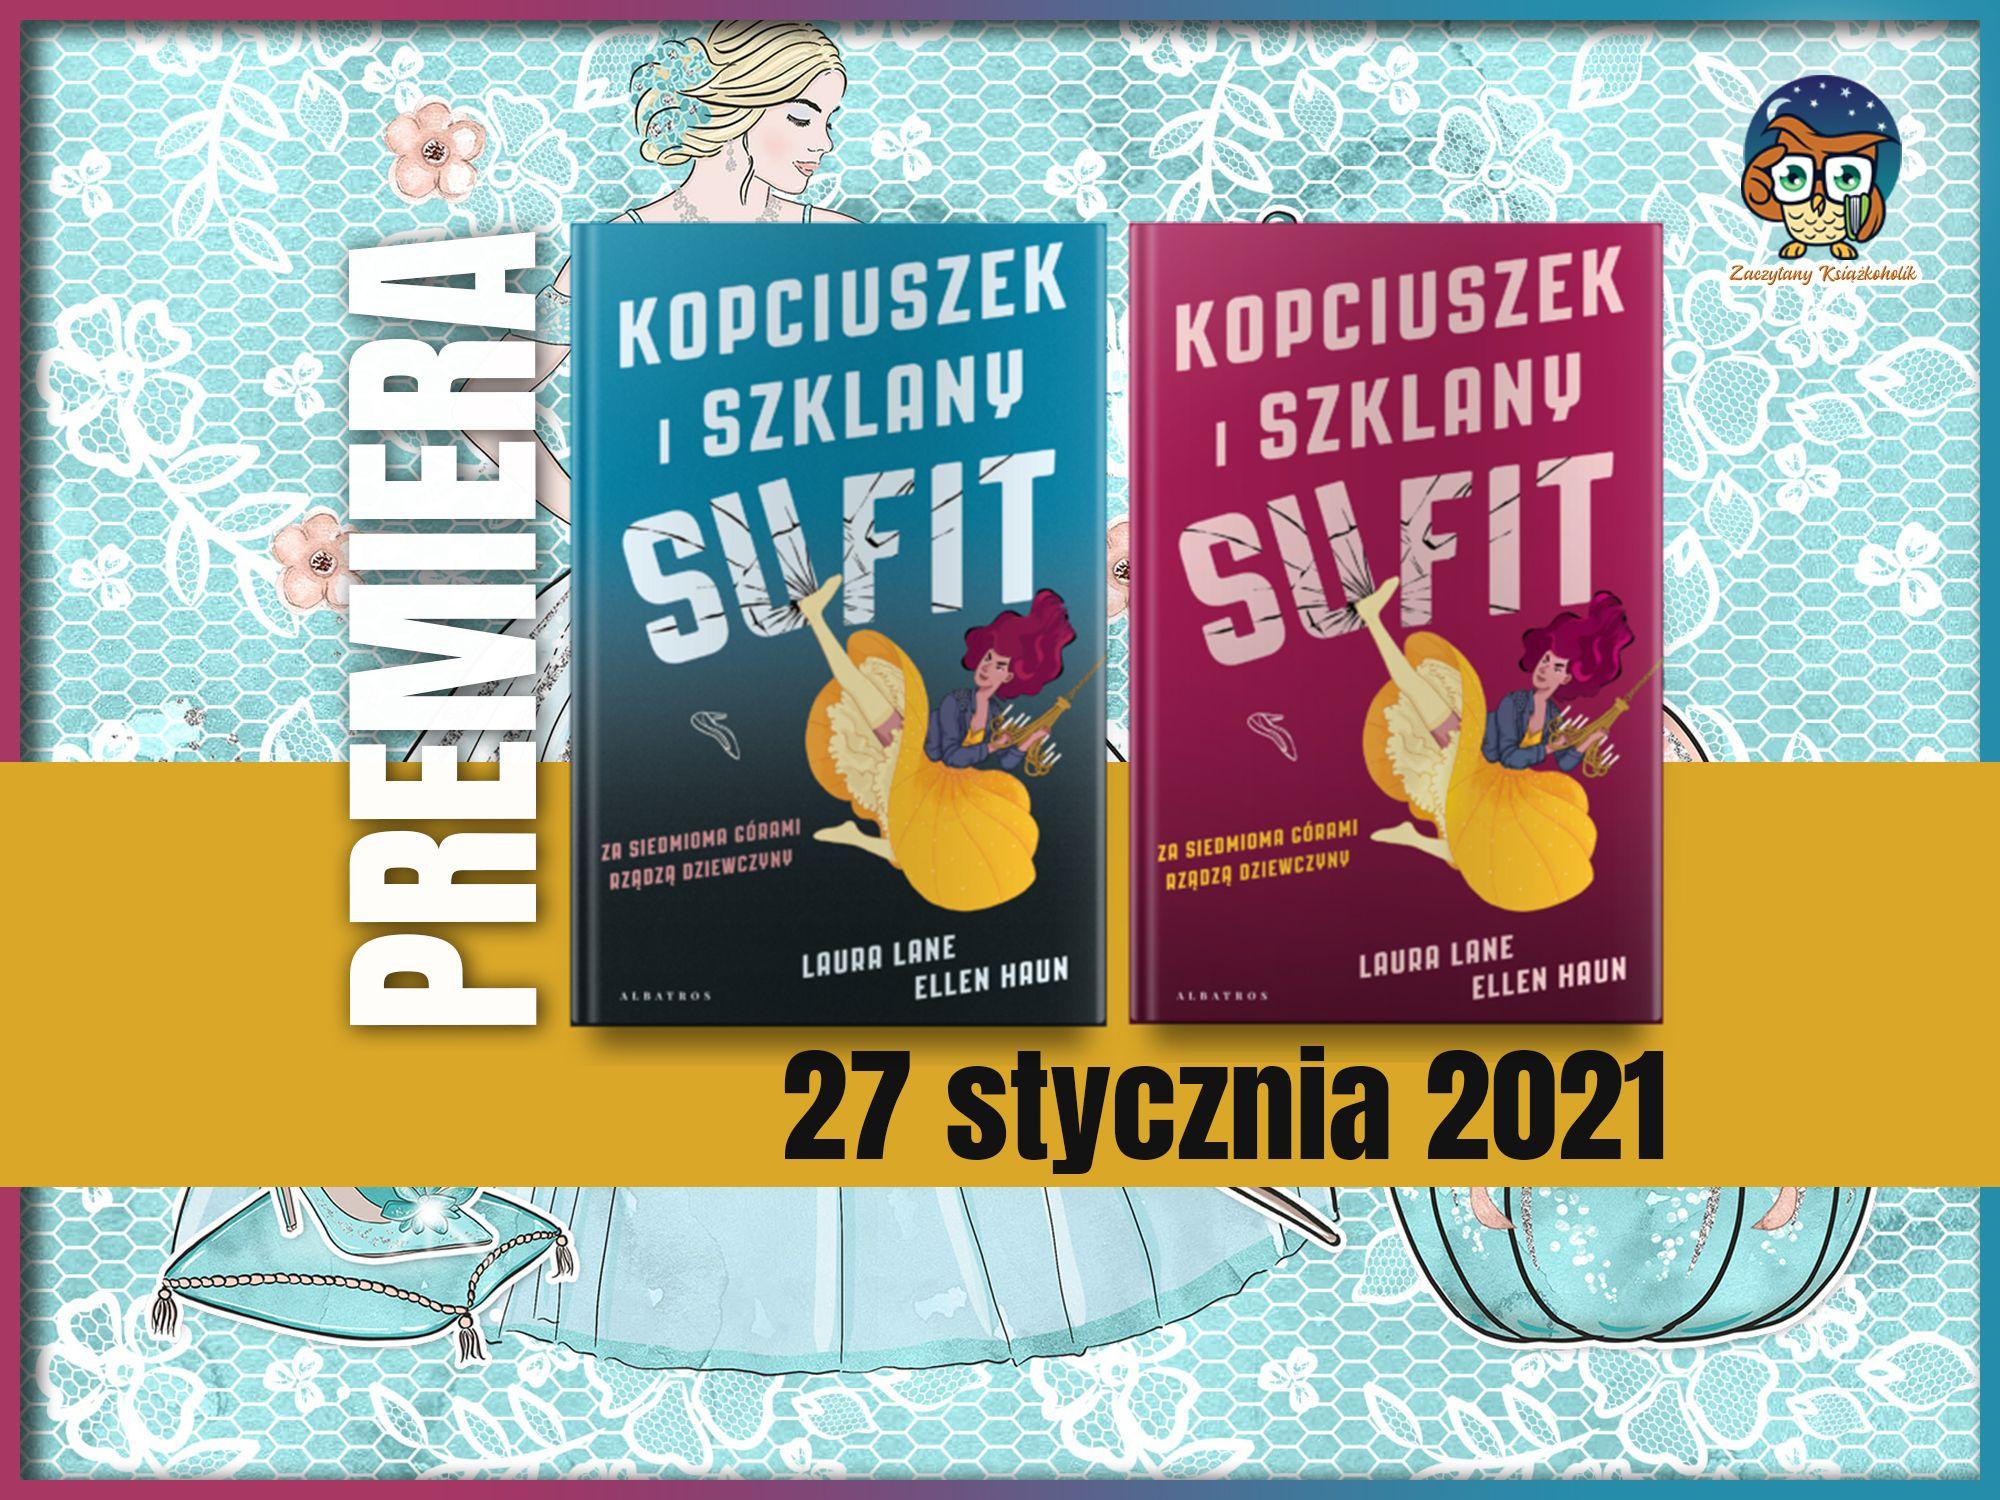 Laura Lane, Ellen Haun, Kopciuszek i szklany sufit, zaczytanyksiazkoholik.pl